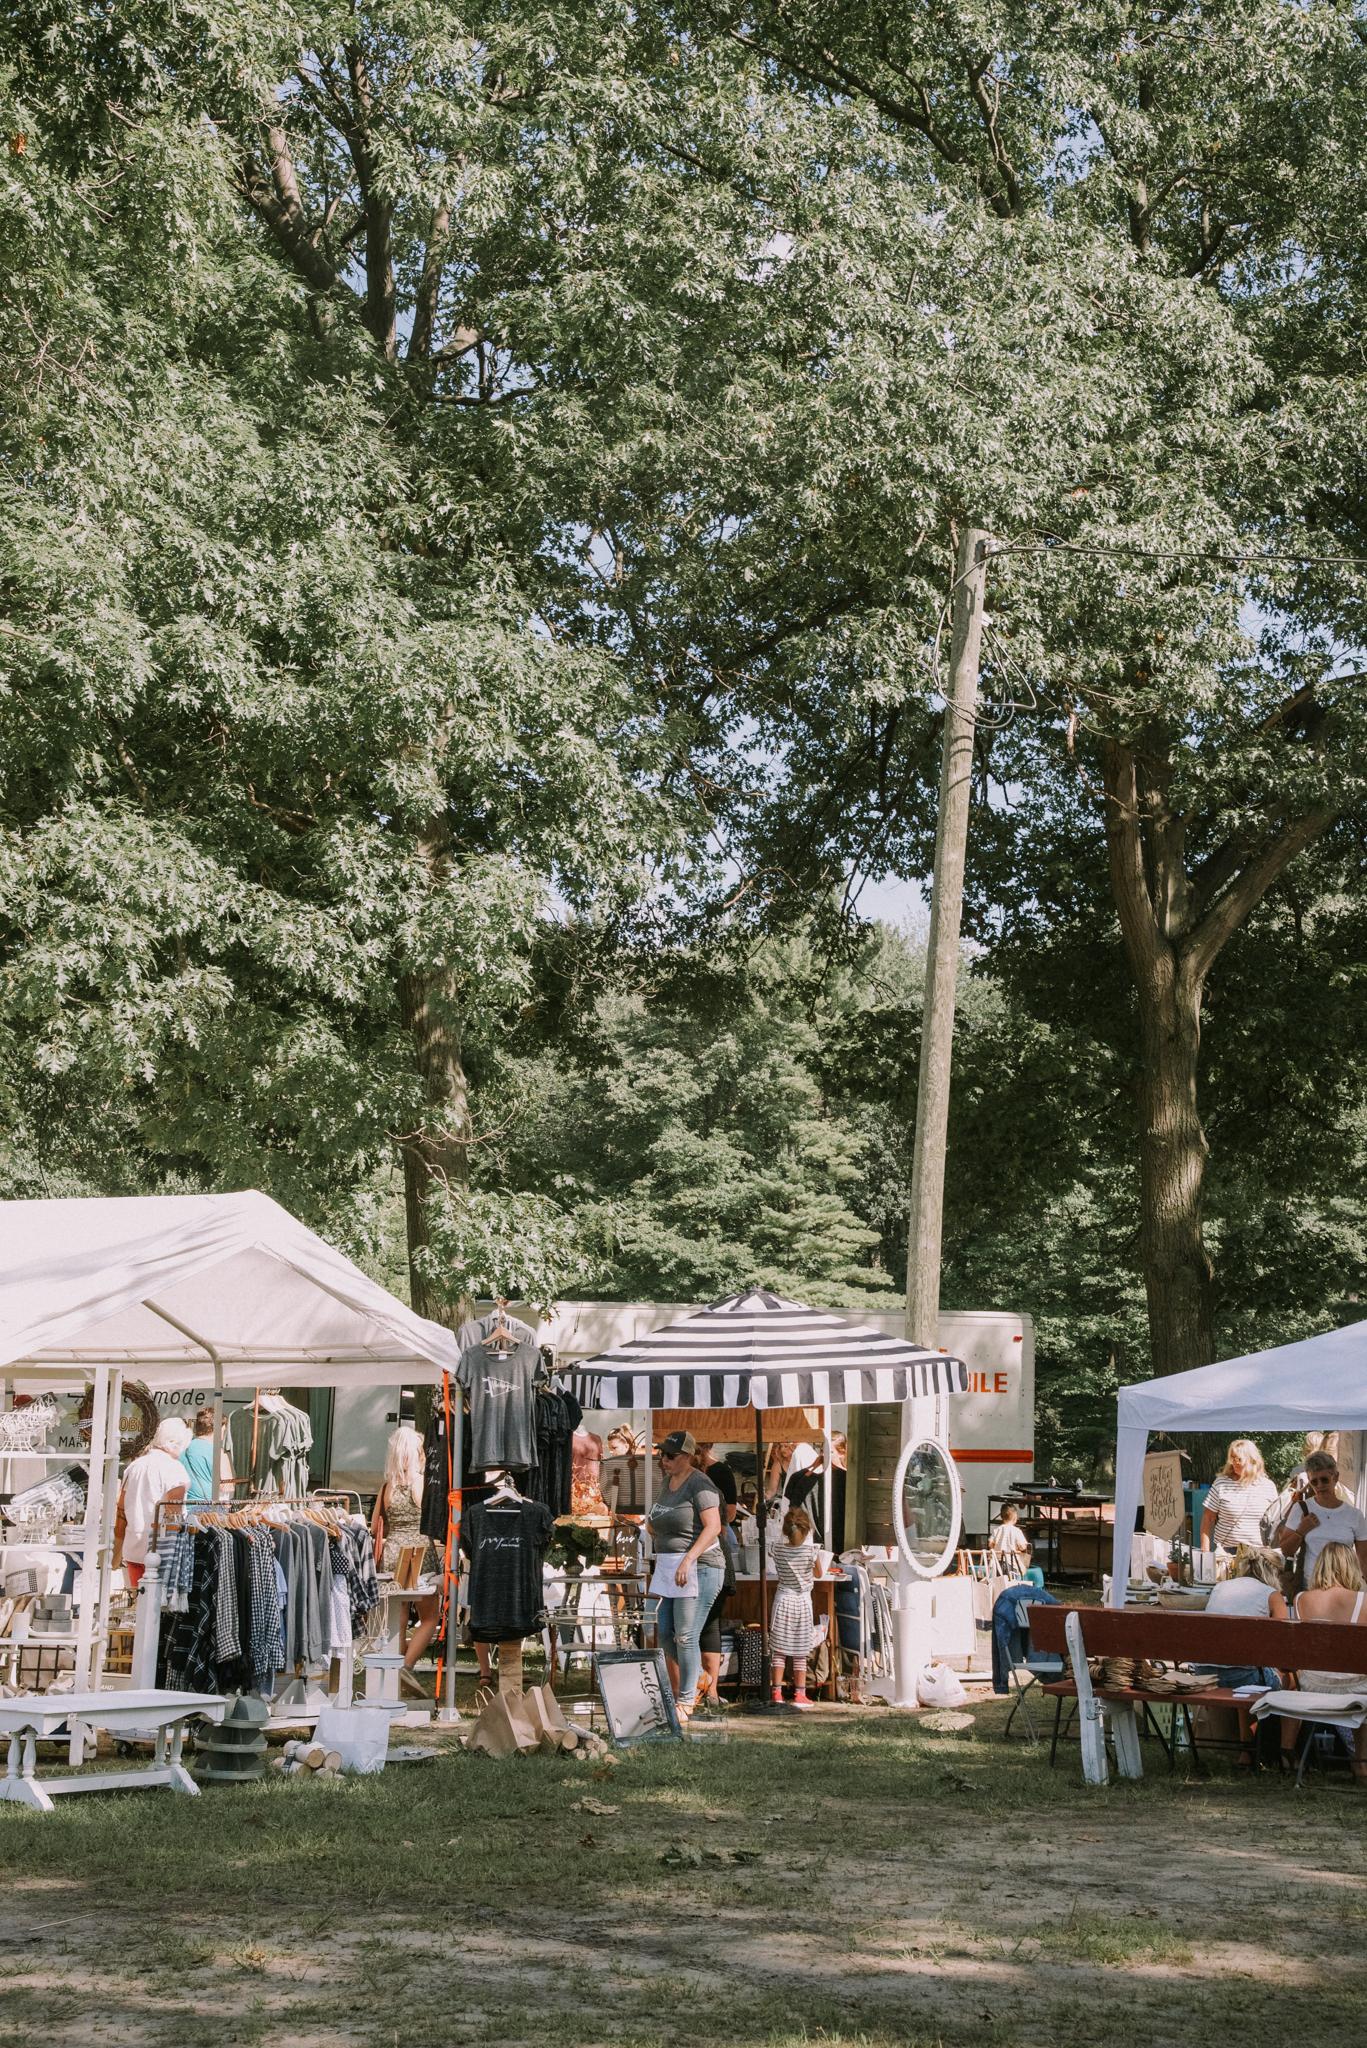 found-cottage-mercantile-market